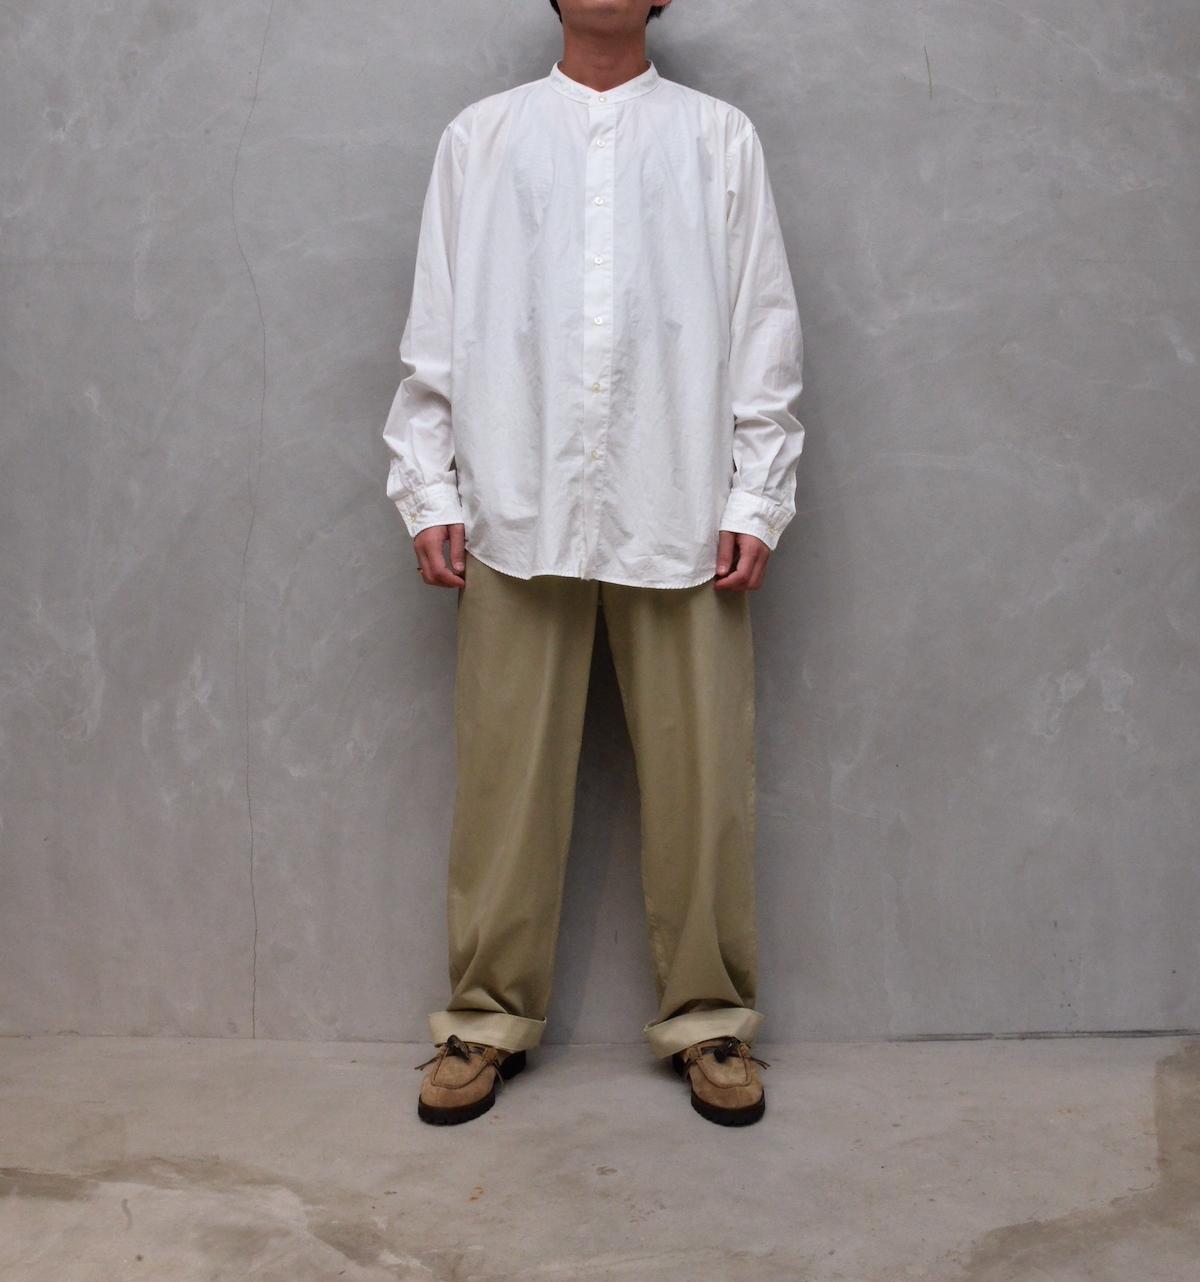 CIOTA 「 スビンコットン タイプライター バンドカラーシャツ / ホワイト 」